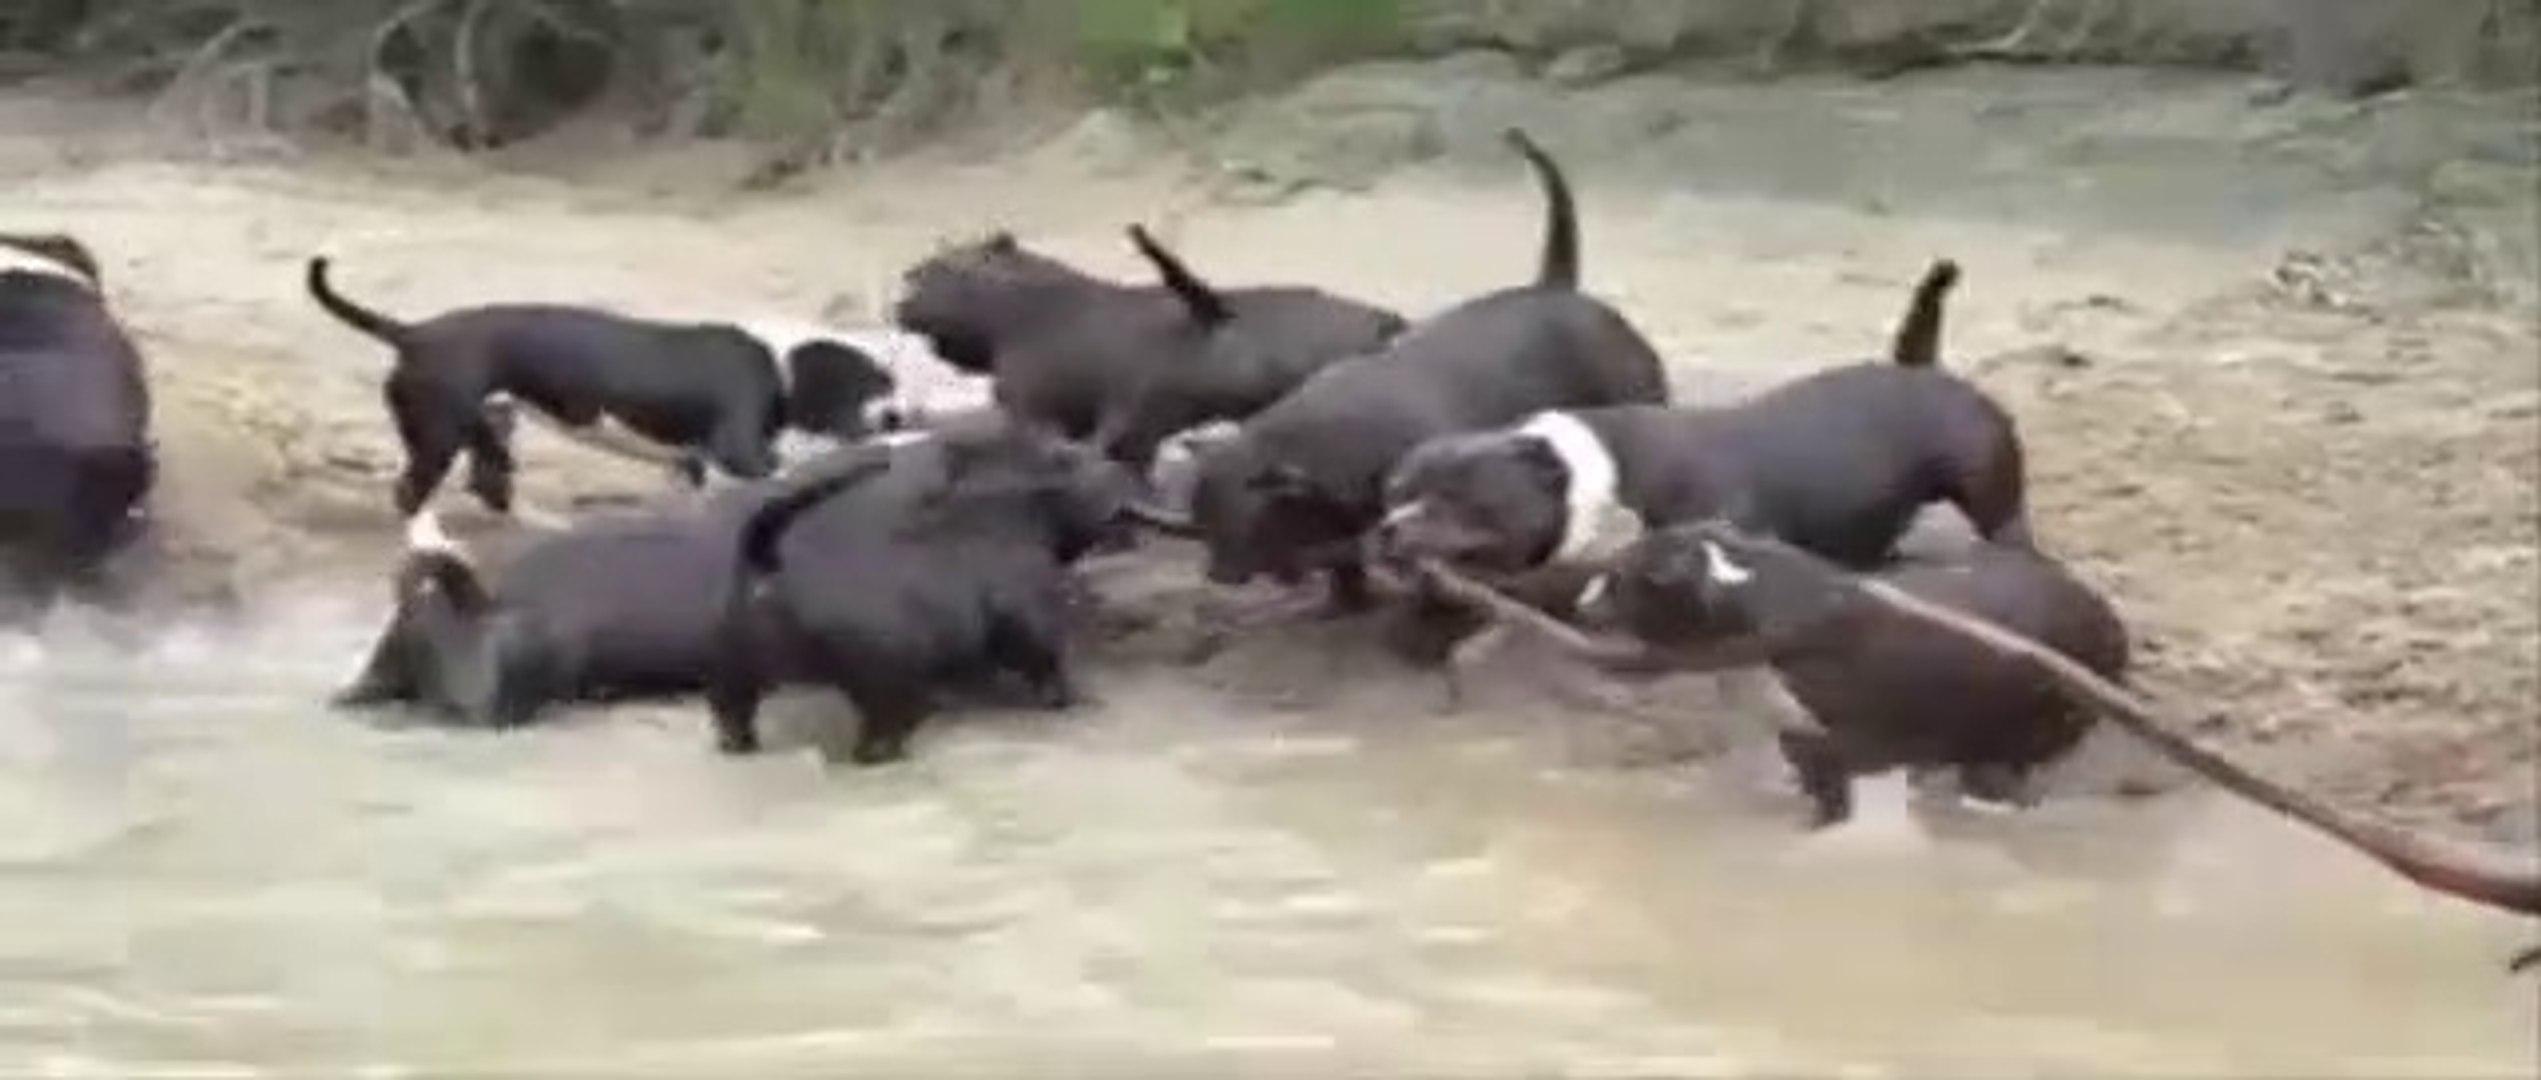 PiTBULL KOPEKLERiNE AGIR KOMANDA EGiTiMi - Pitbull Dogs Millitary Education